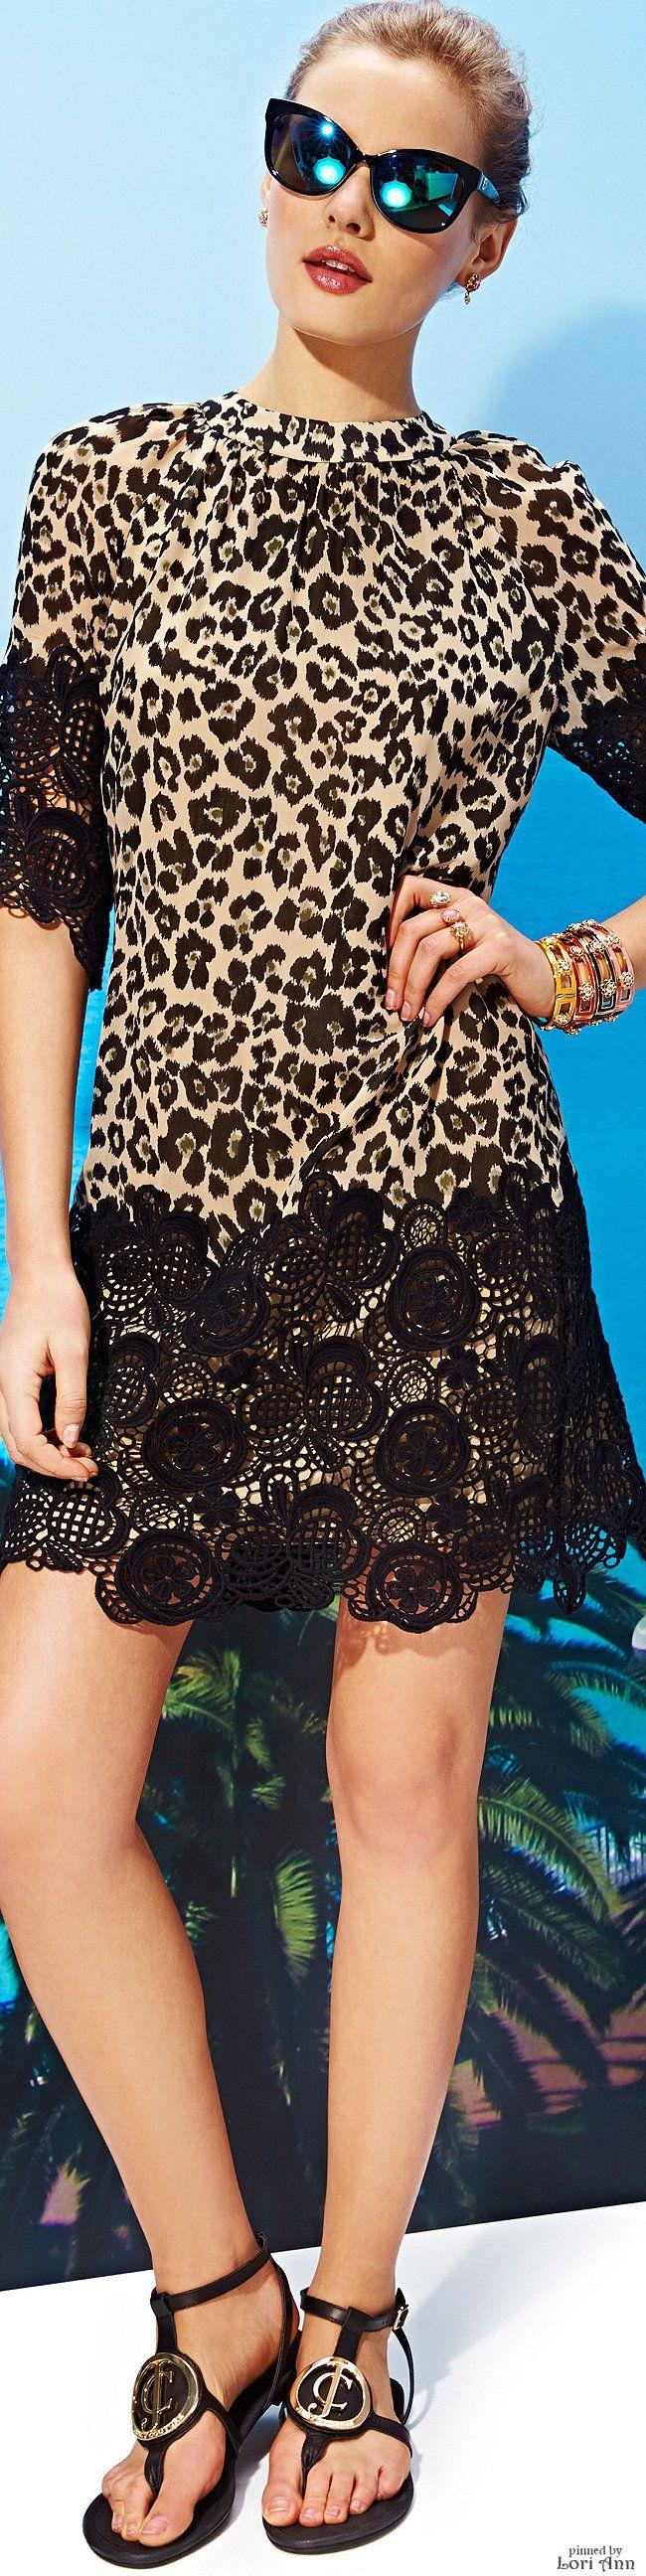 Leopard dress for beautiful predator 83